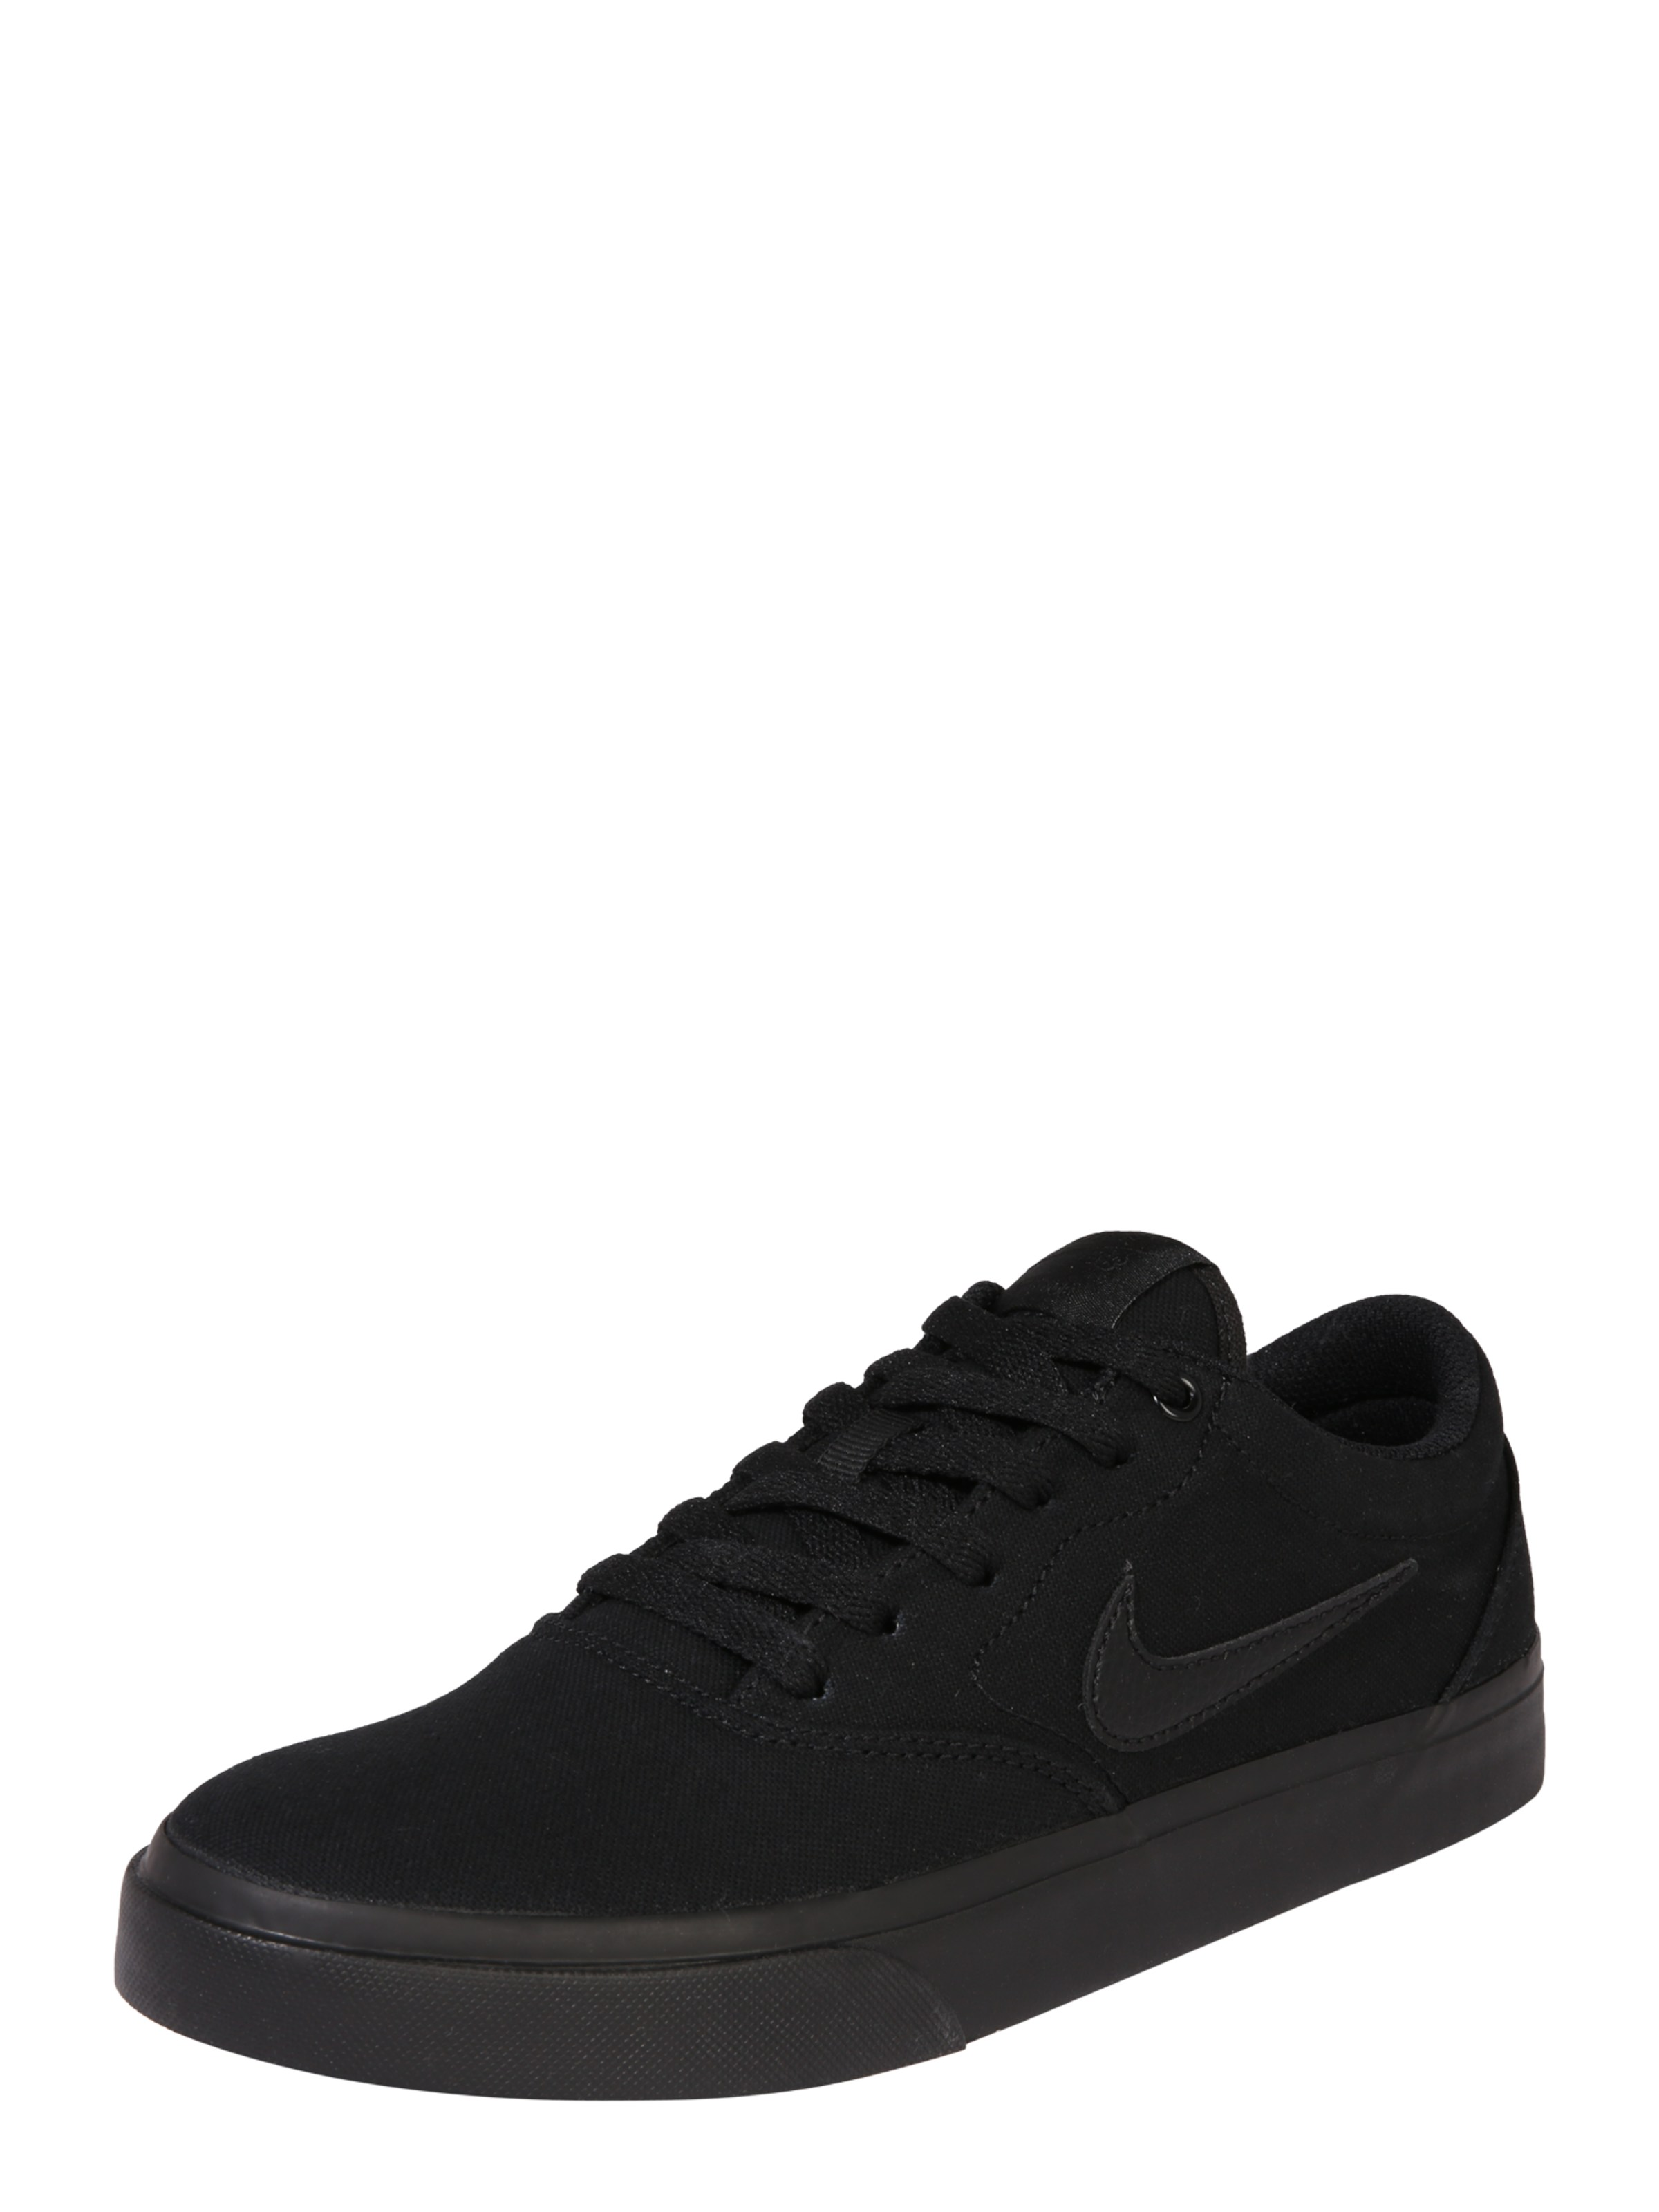 Nike Juvenate utcai cipő Fekete GLAMI.hu